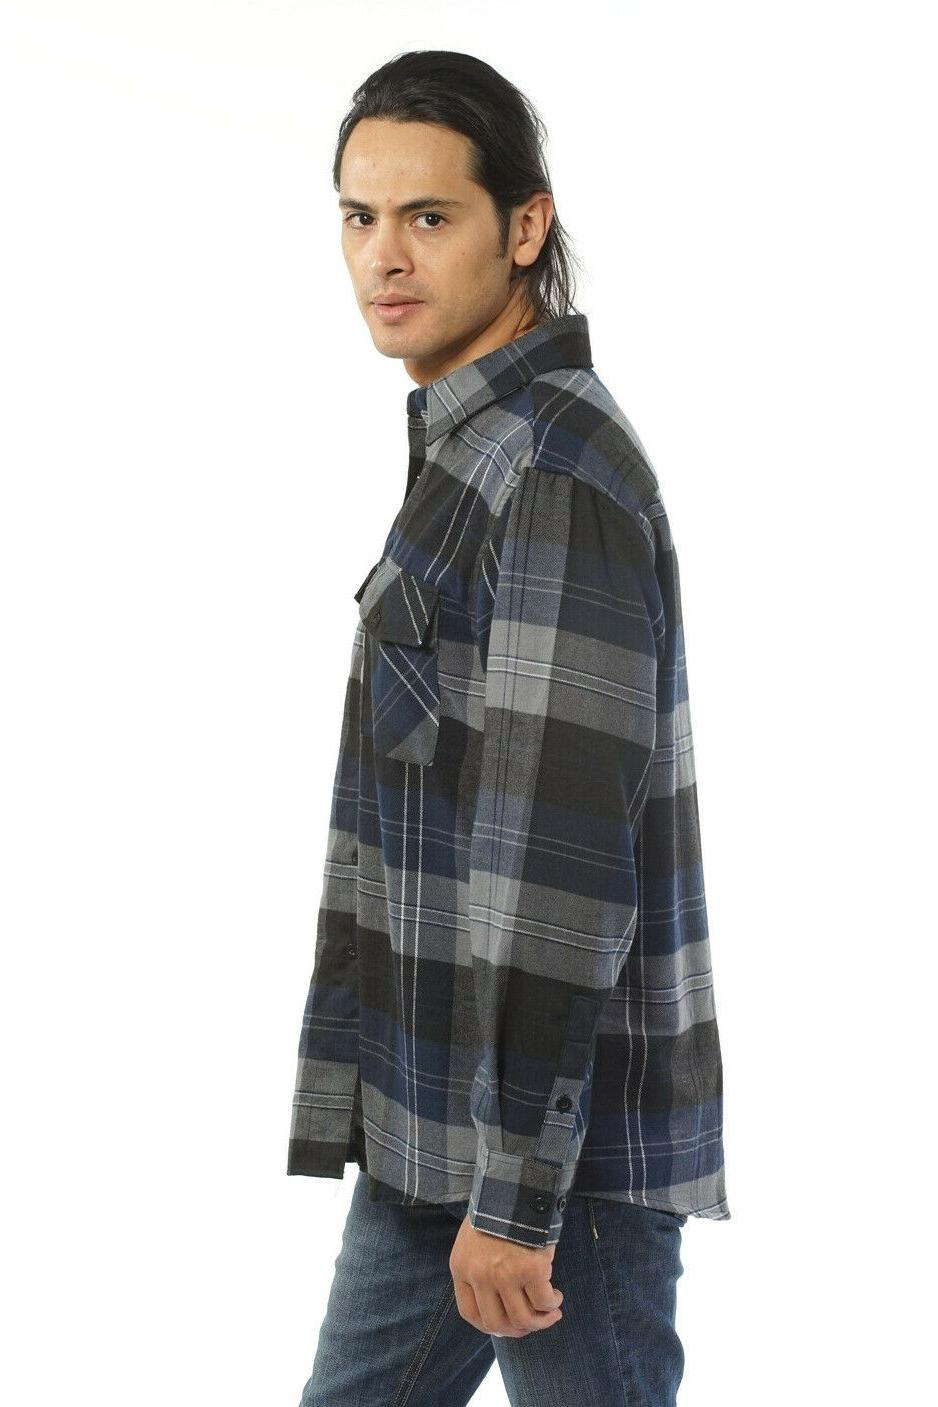 YAGO Men's Plaid Flannel Long Down Shirt Blue/2E